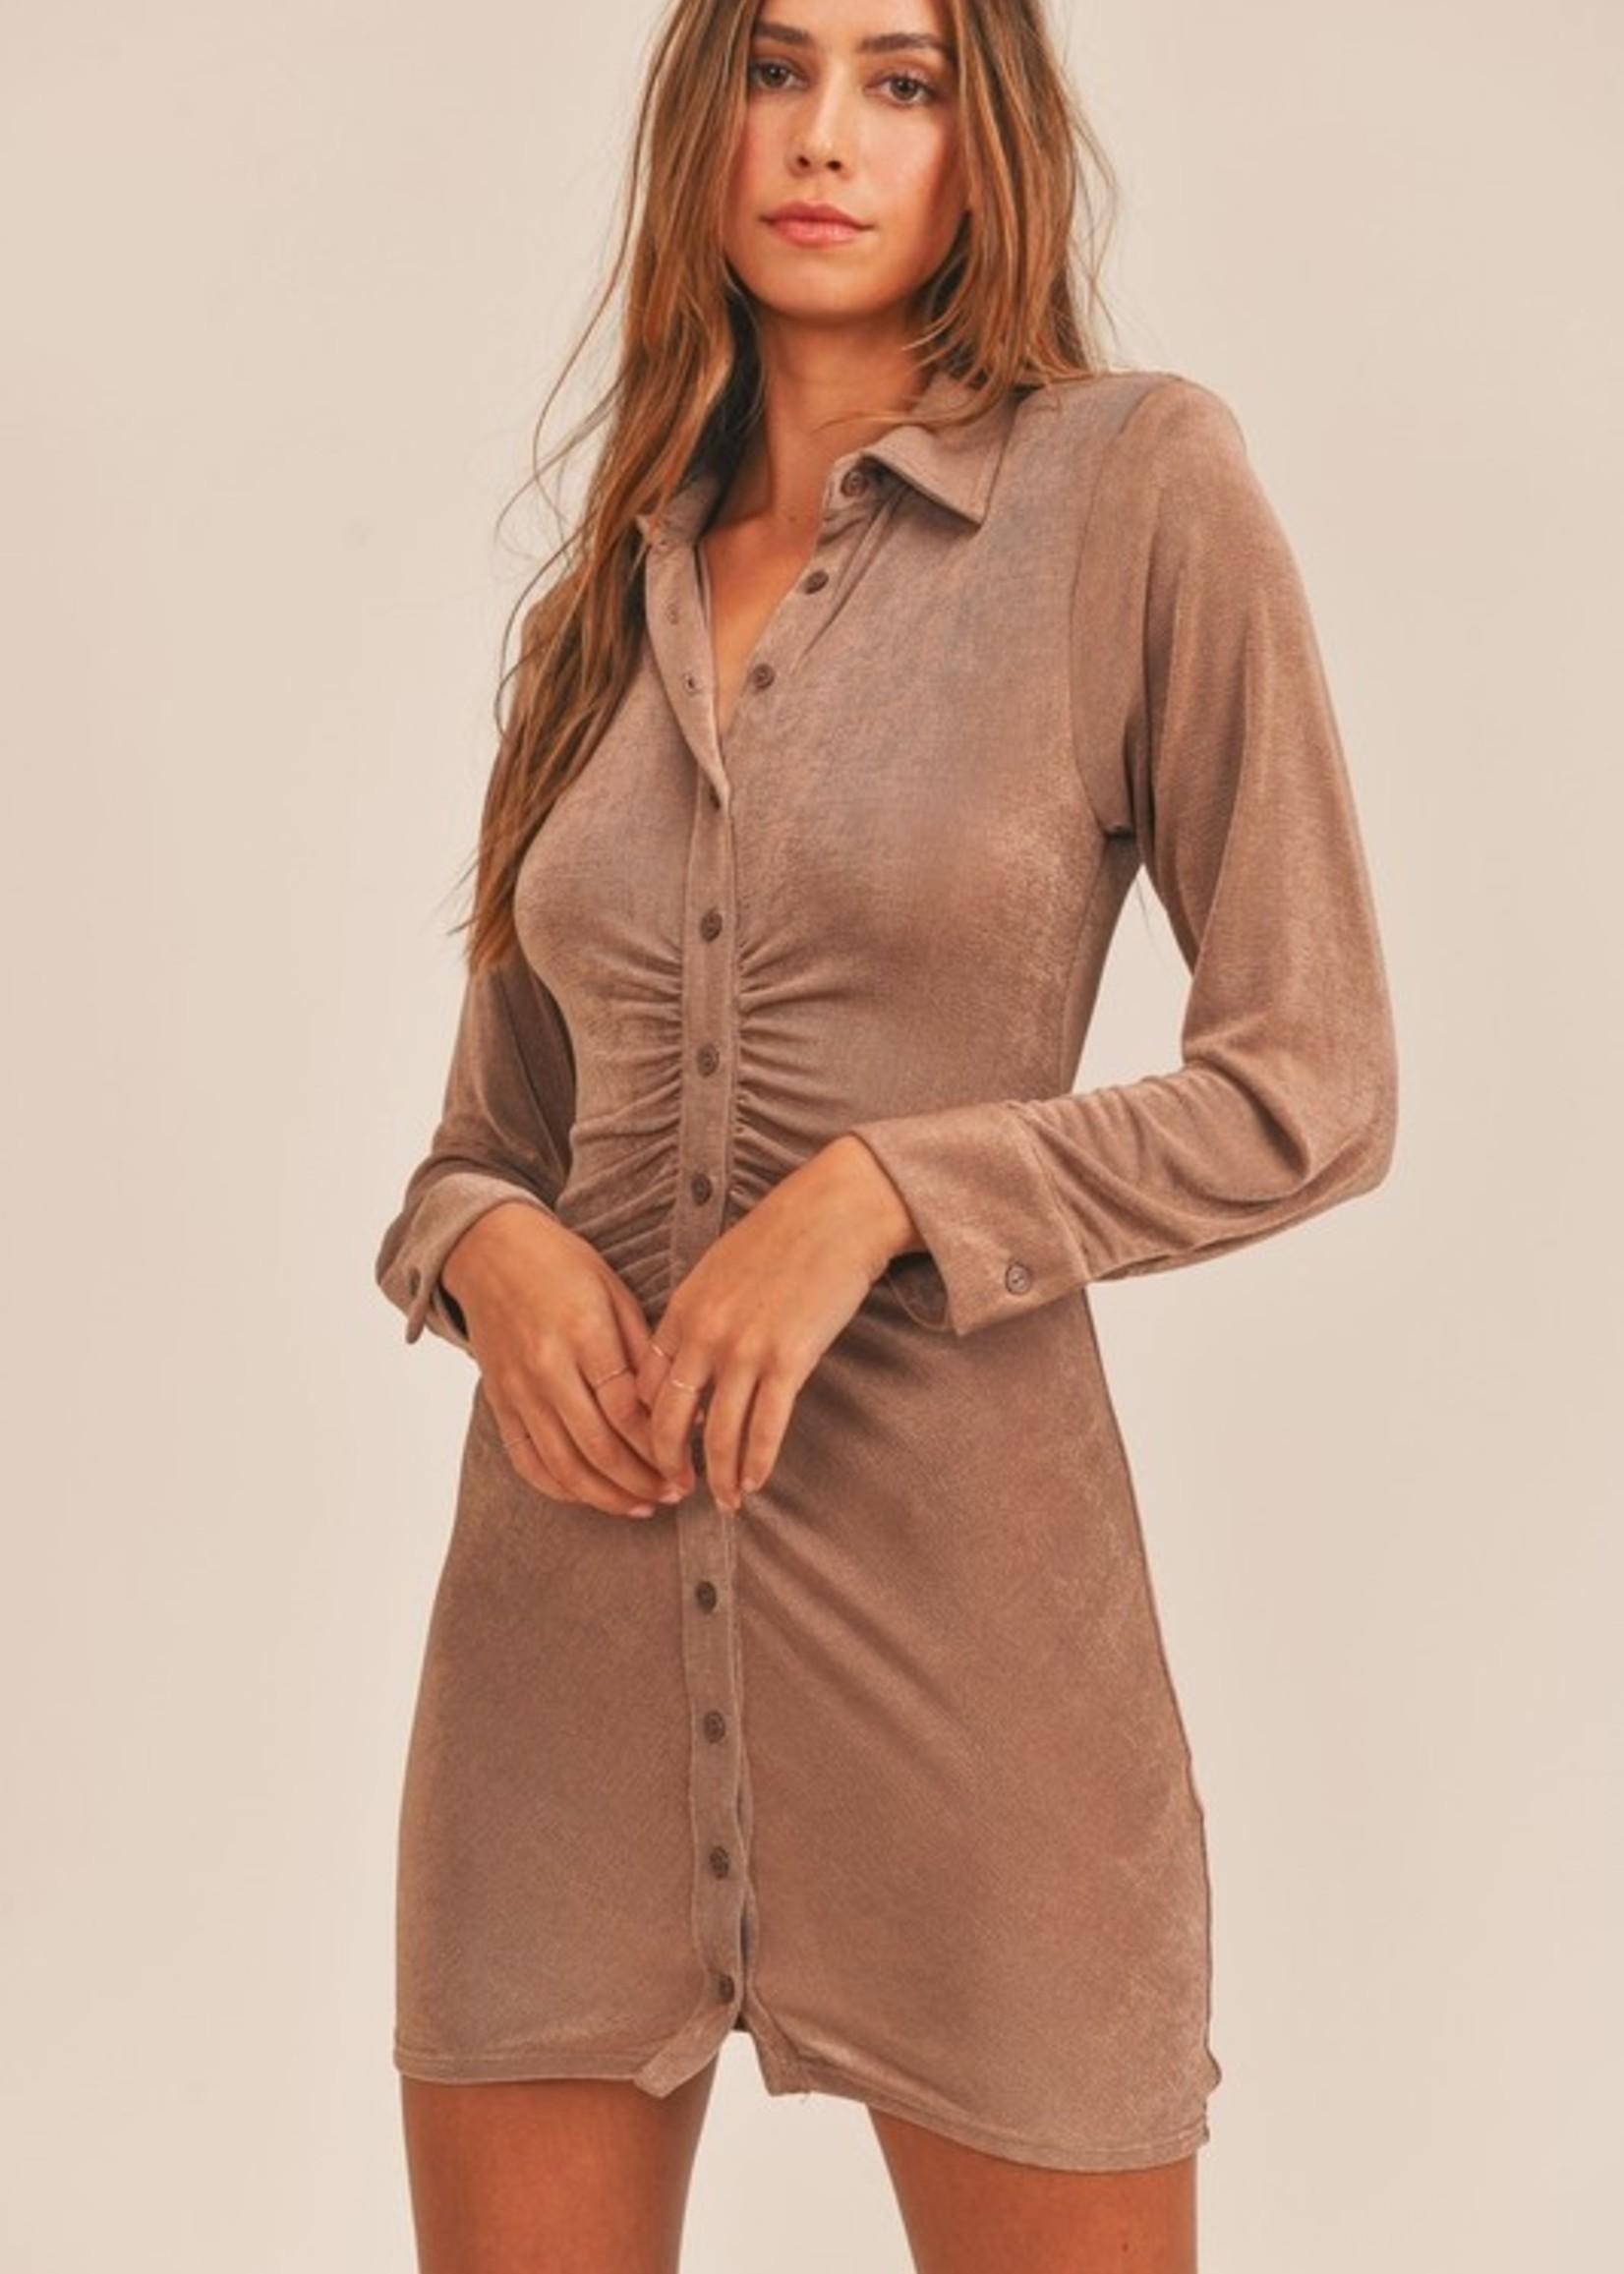 Slinky button down dress